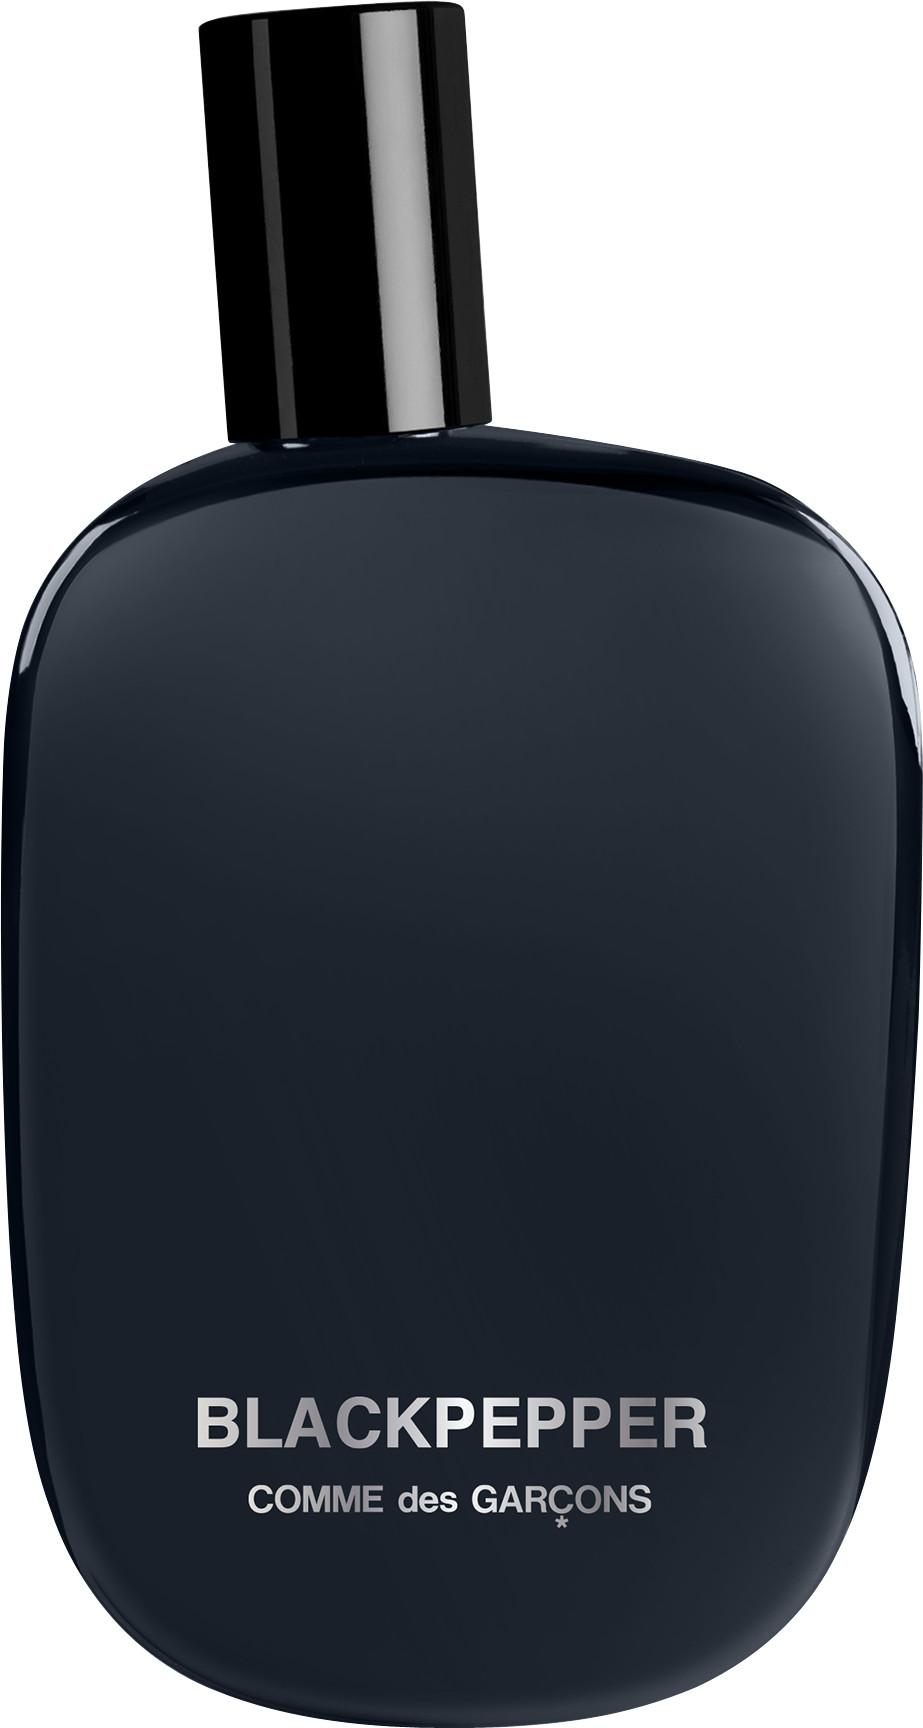 Парфюмированная вода Comme des Garcons Blackpepper для мужчин и женщин  - edp 100 ml tester